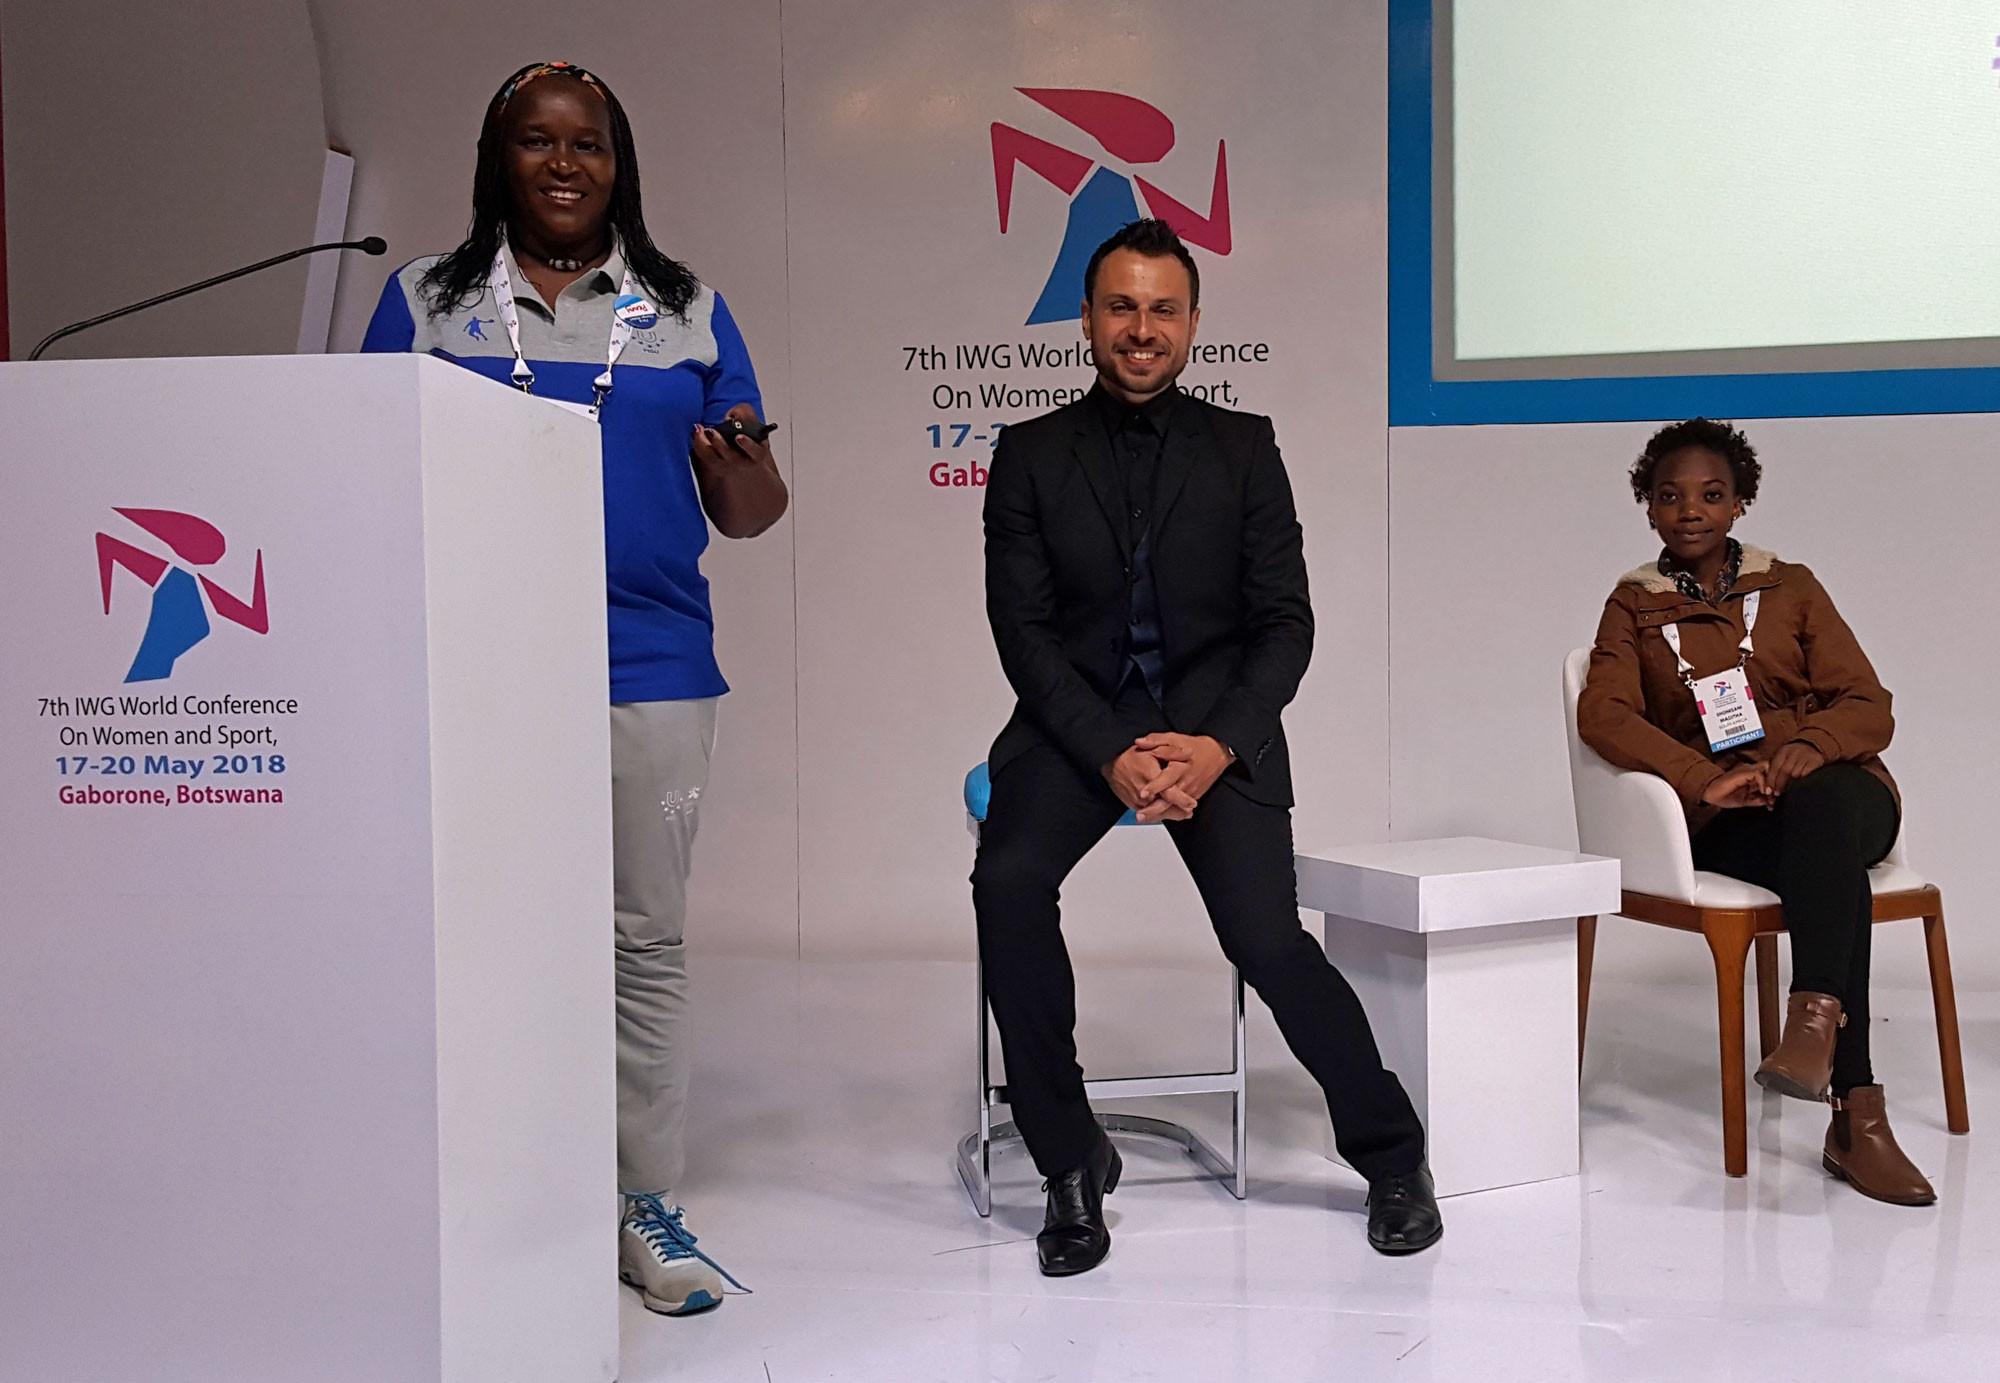 A global conference promoting women in sport was held last month in Botswana ©FISU